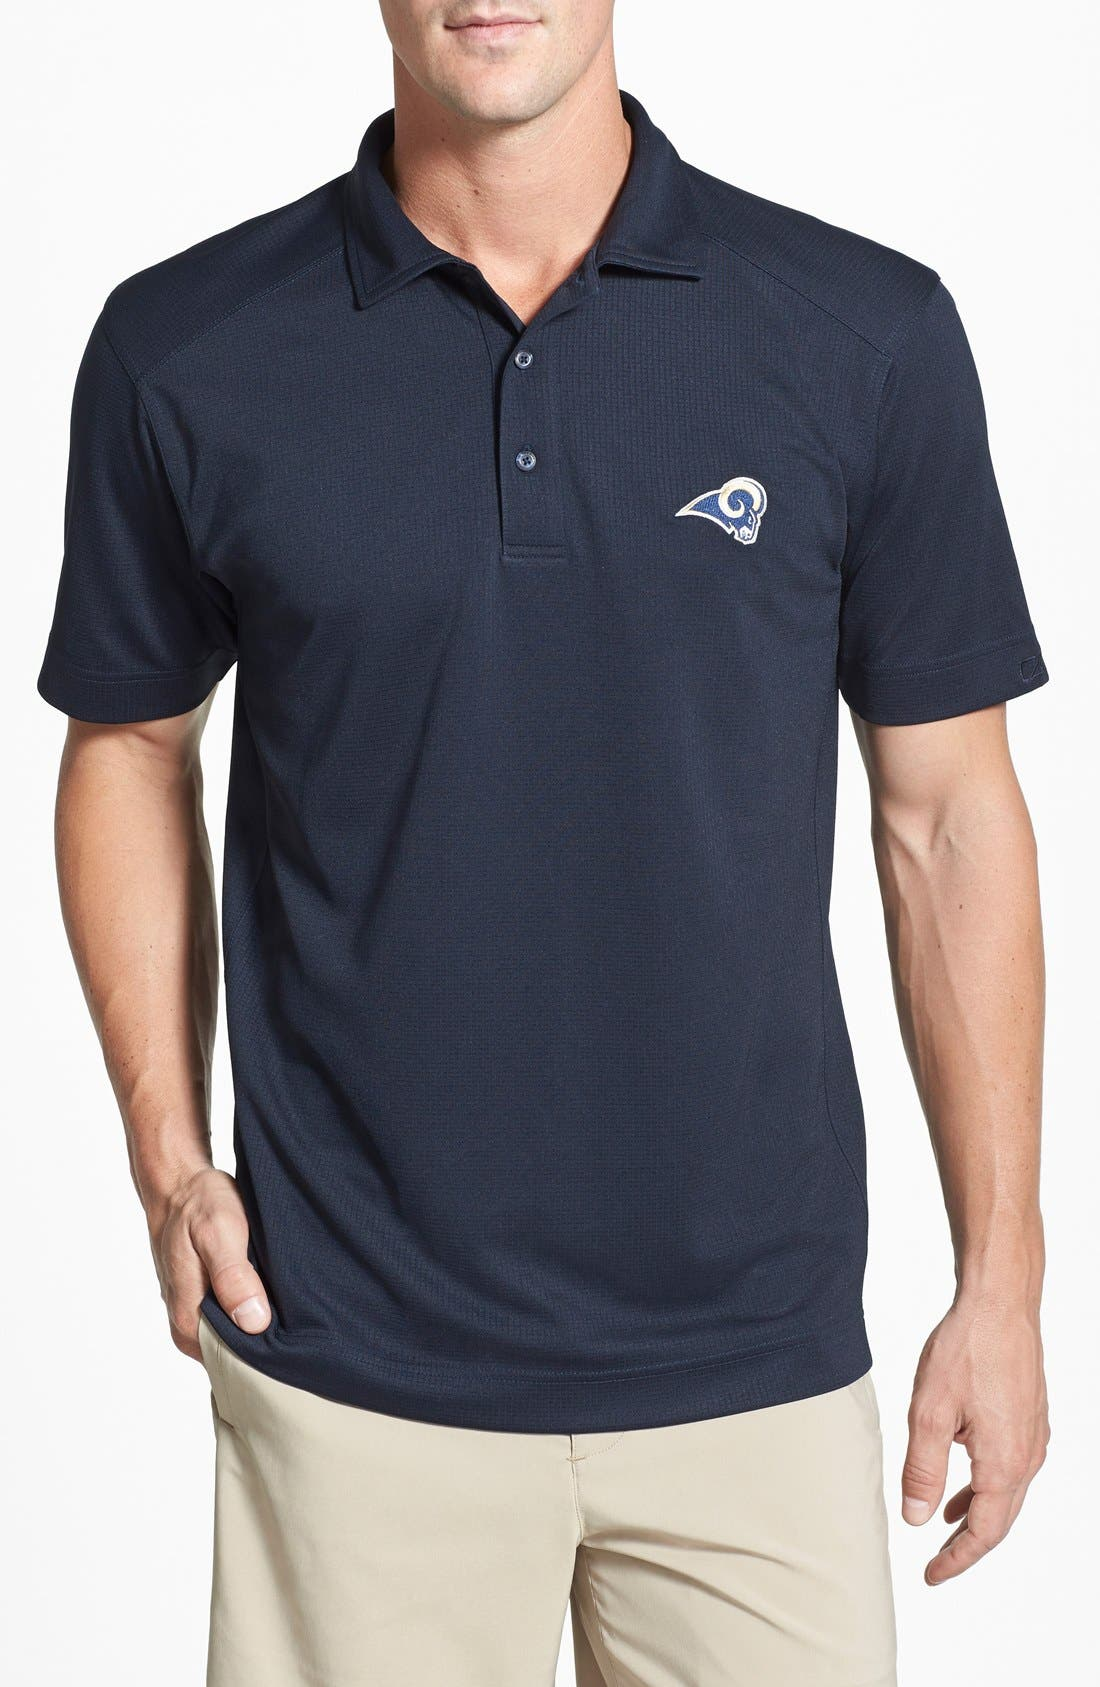 Los Angeles Rams - Genre DryTec Moisture Wicking Polo,                             Main thumbnail 1, color,                             420